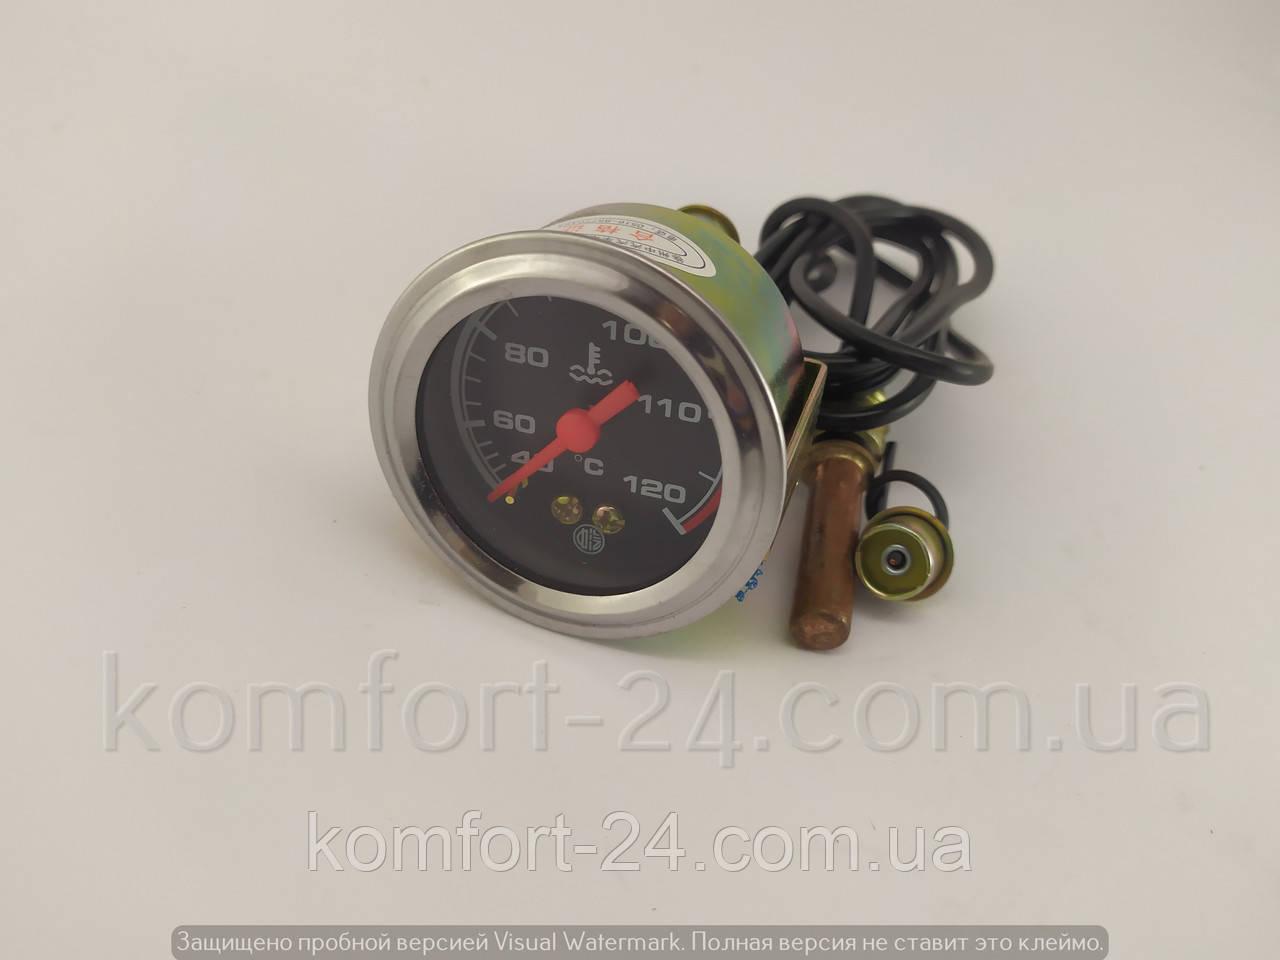 Датчик температуры воды мототрактор мотоблок